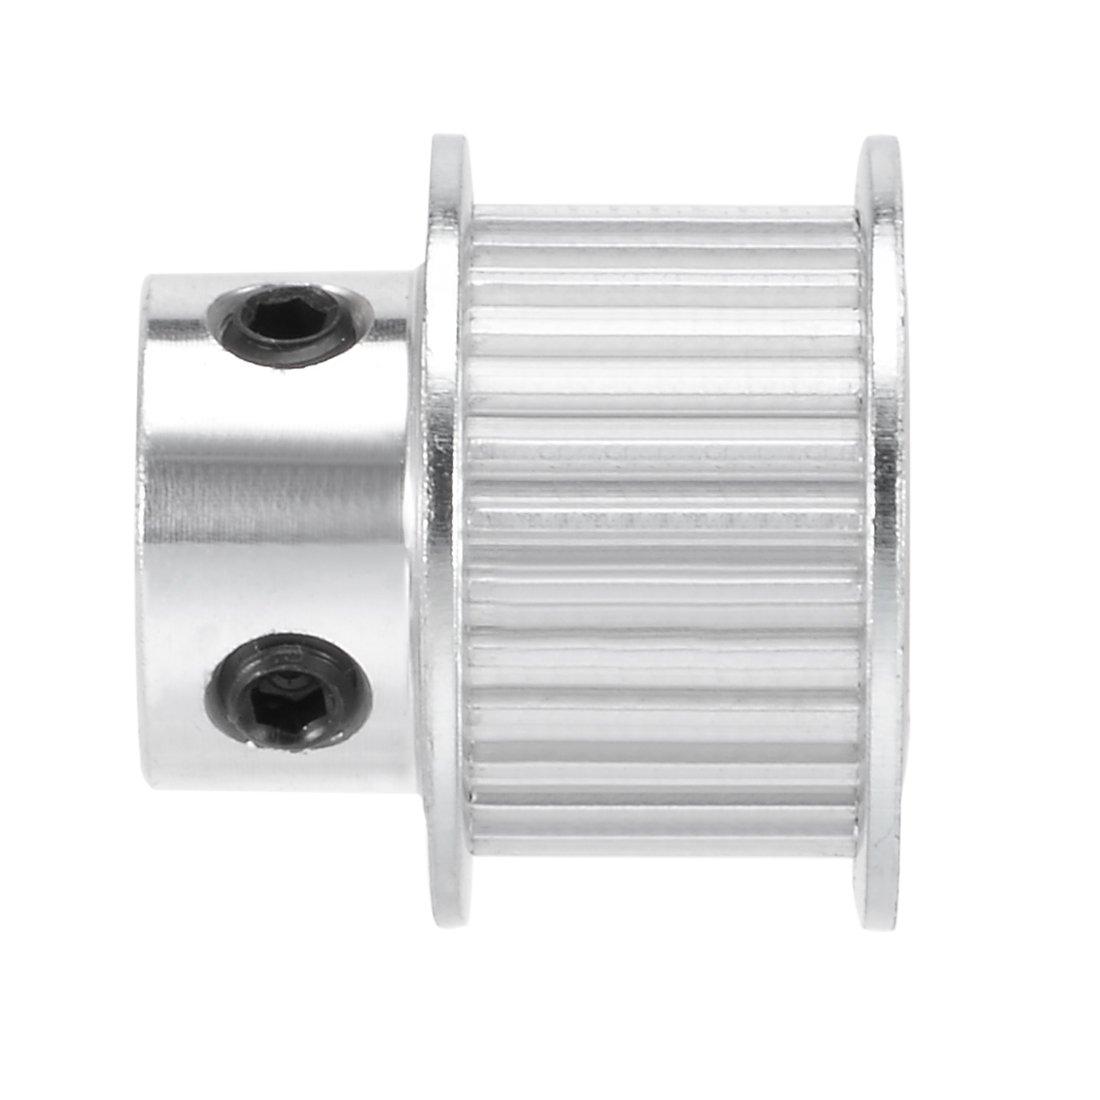 uxcell Aluminum MXL 25 Teeth 7mm Bore Timing Belt Idler Pulley Flange Synchronous Wheel for 10mm Belt 3D Printer CNC